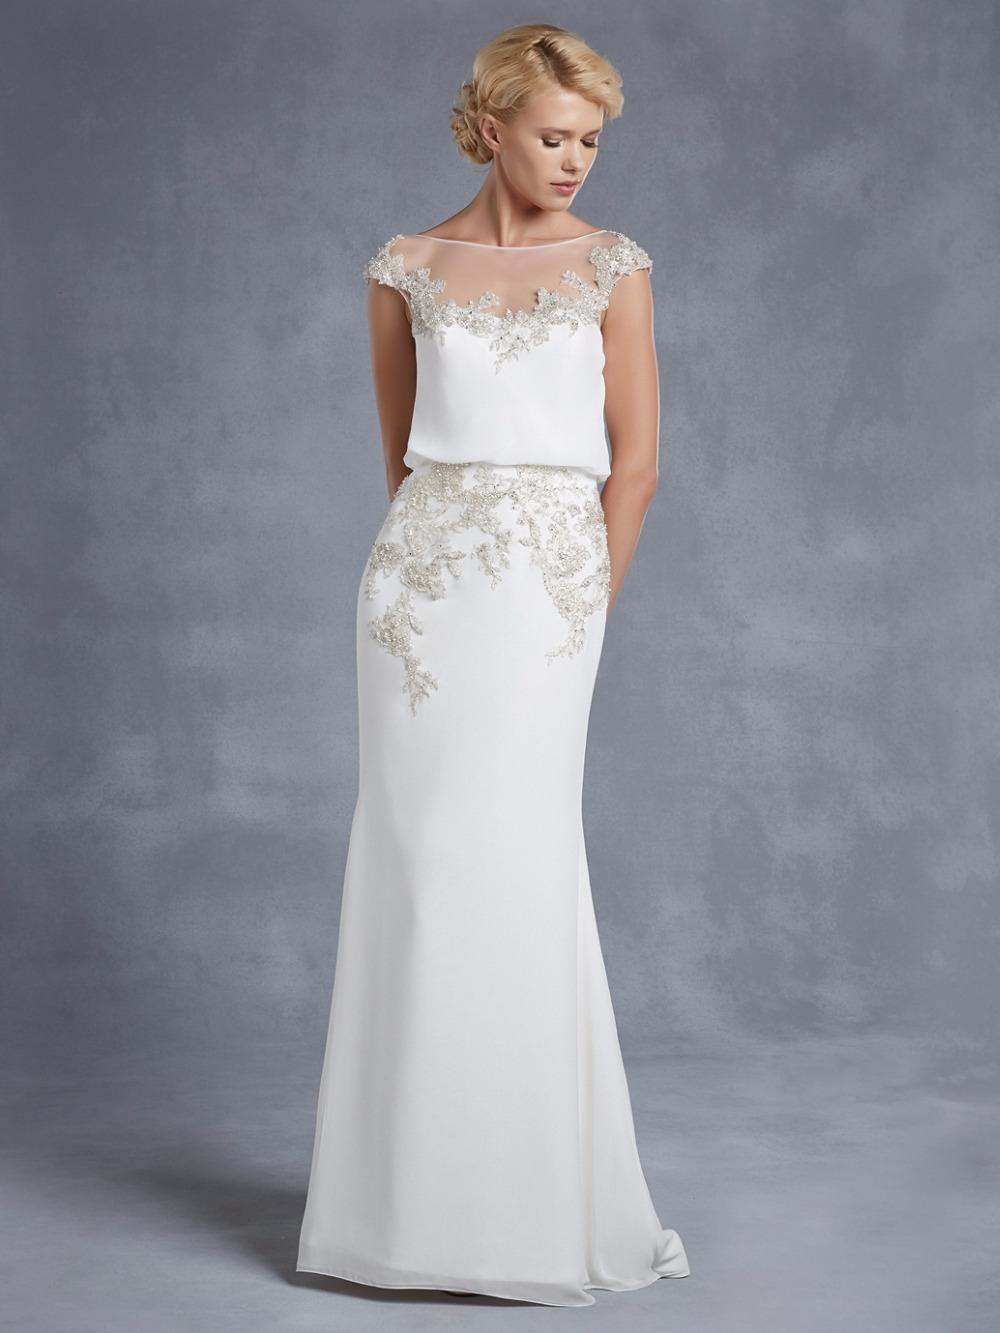 2016 spring summer wedding dresses chiffon applique beads for Backless sheath wedding dresses